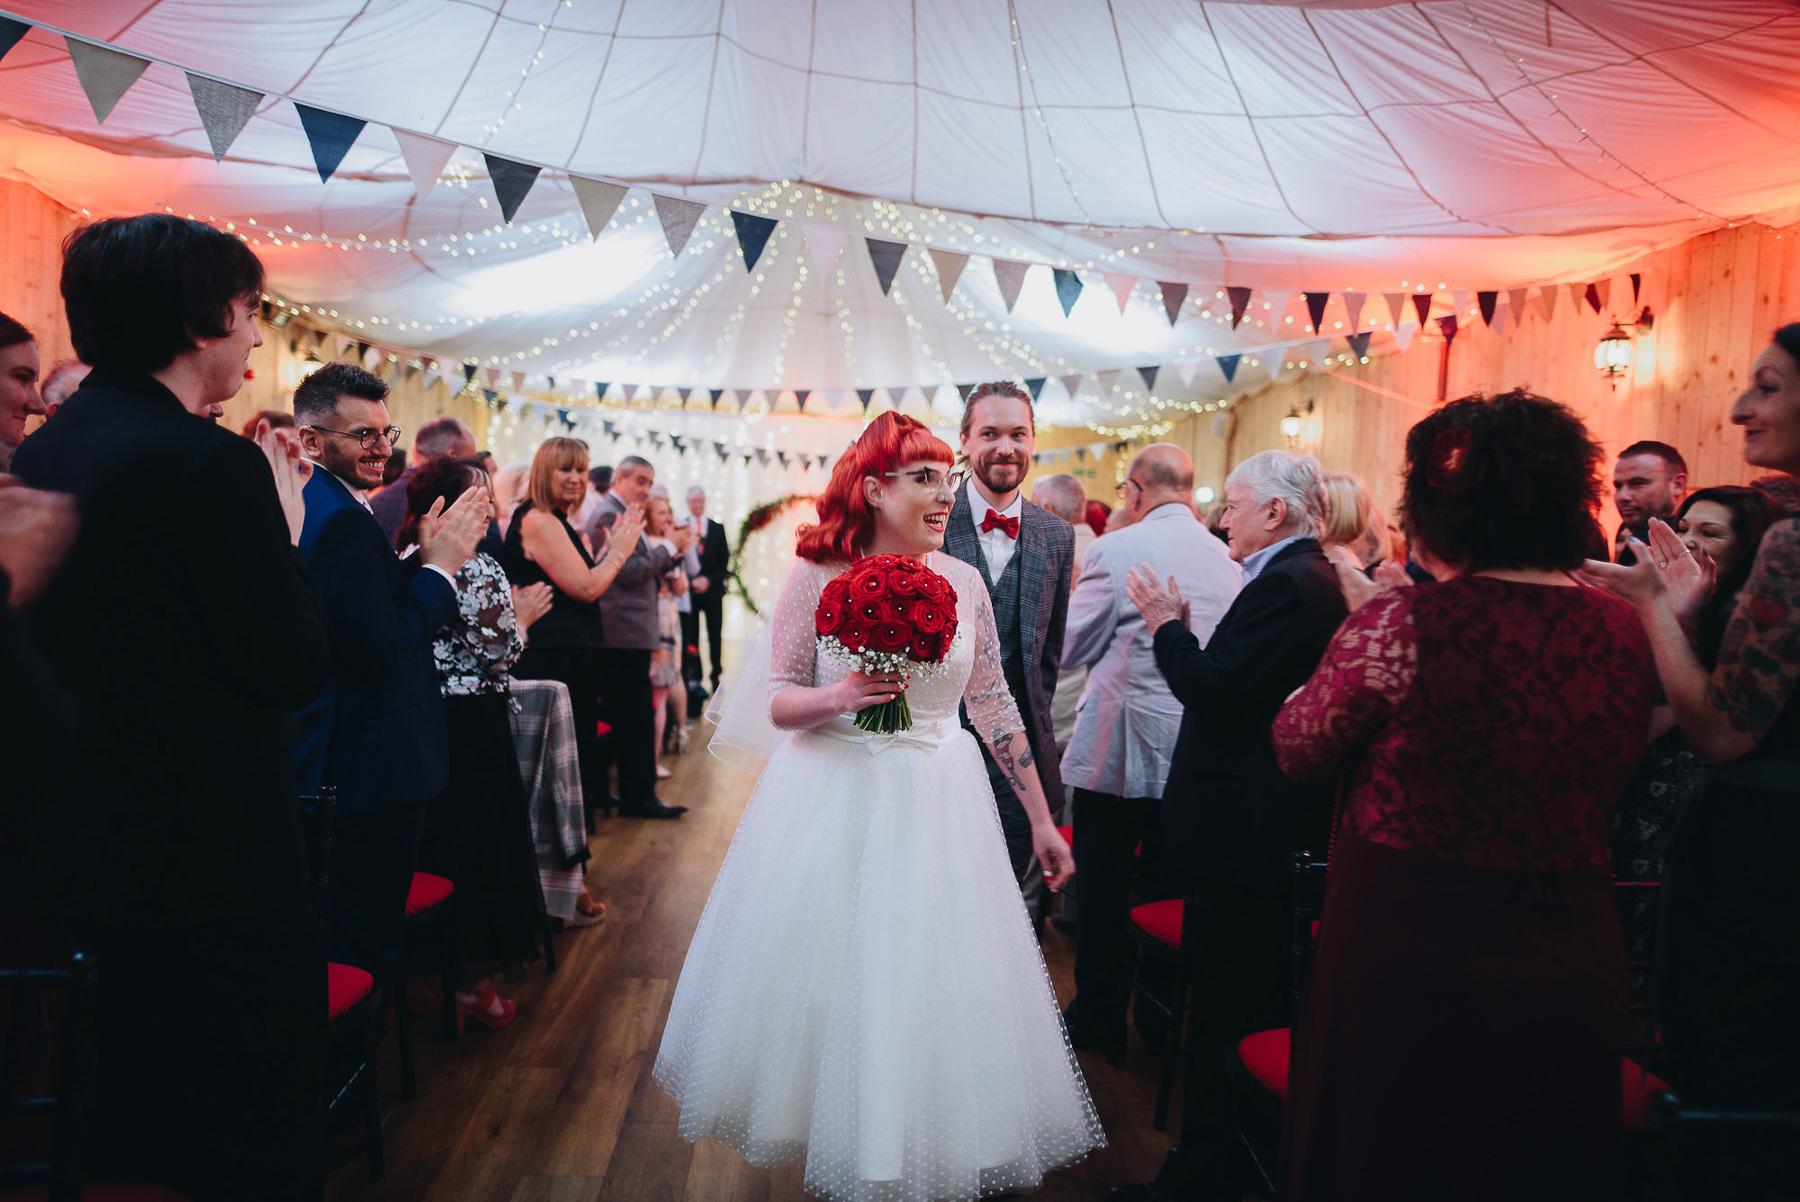 Wellbeing_Farm_Wedding_Photography_The_Pin-Up_Bride_Lara_Shaun-72.jpg